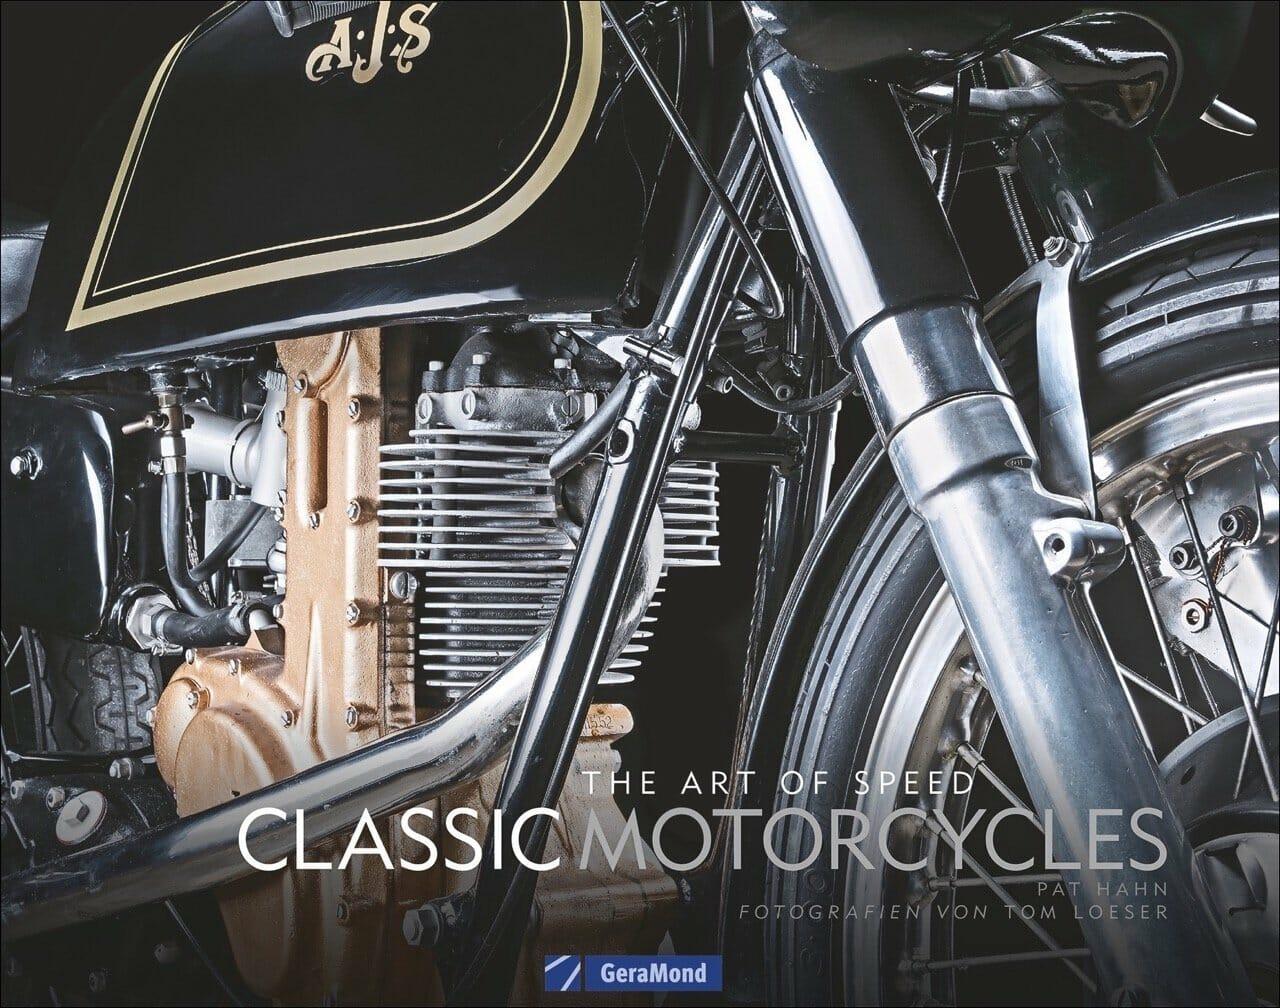 The Art of Speed: Classic Motorcycles – die revolutionärsten Motorräder der Welt